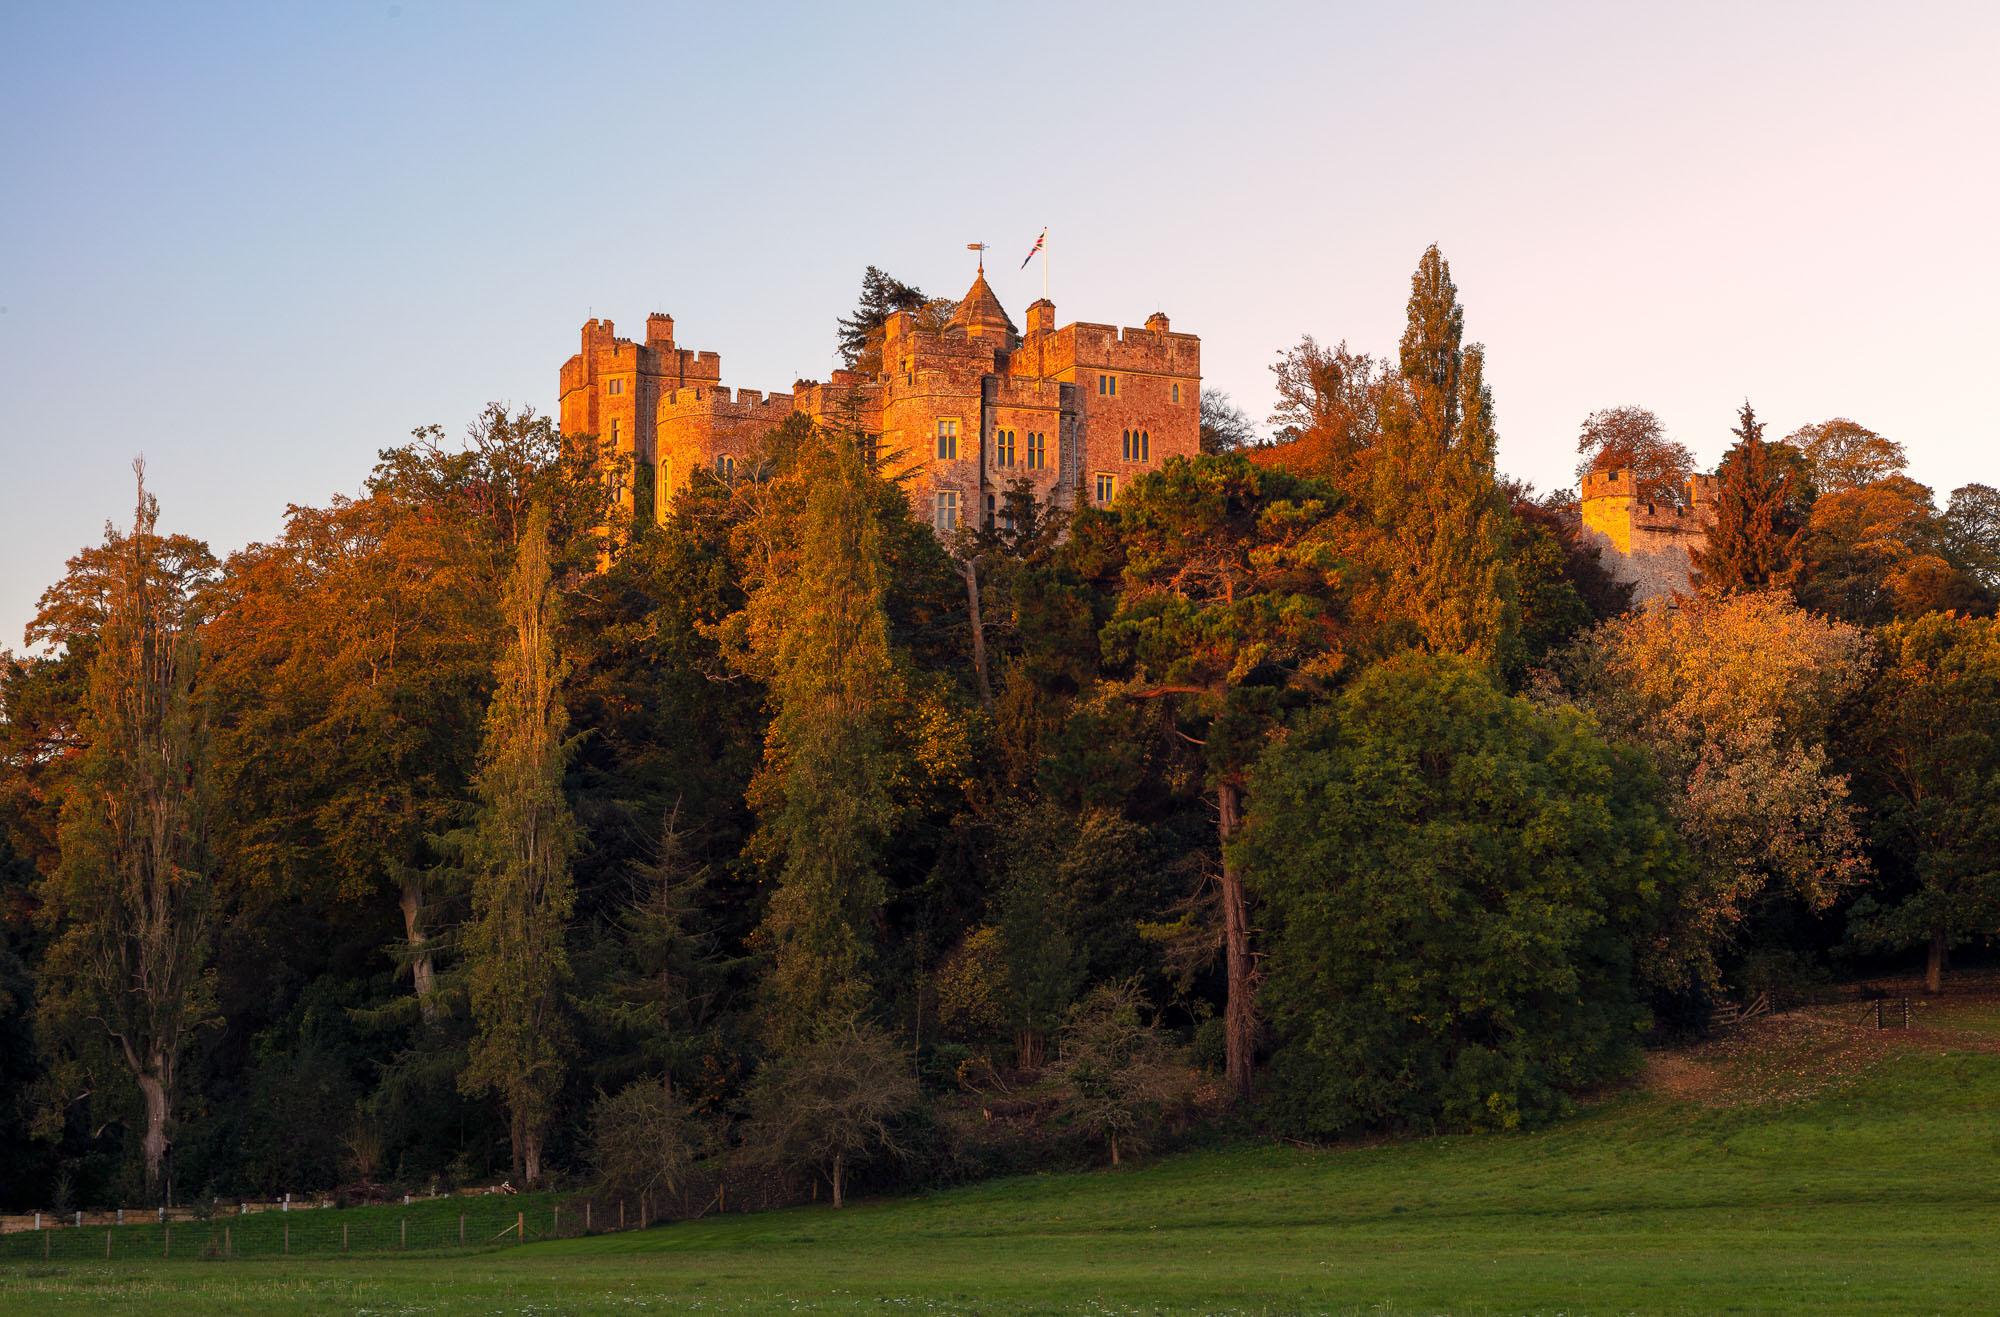 Dunster Castle, England, during the golden hour